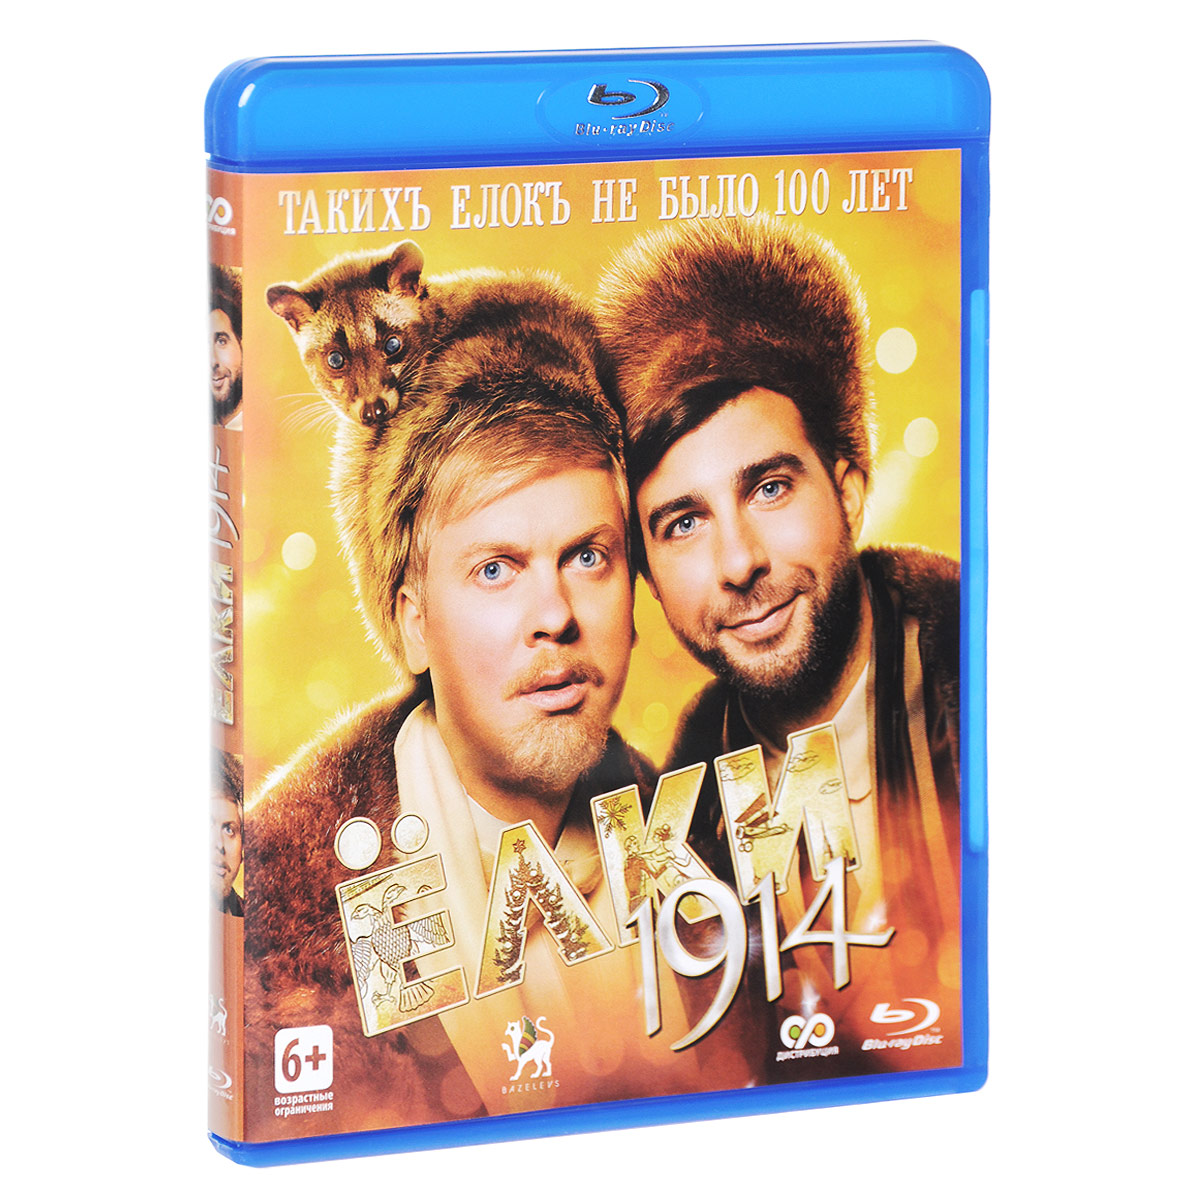 Ёлки 1914 (Blu-ray)